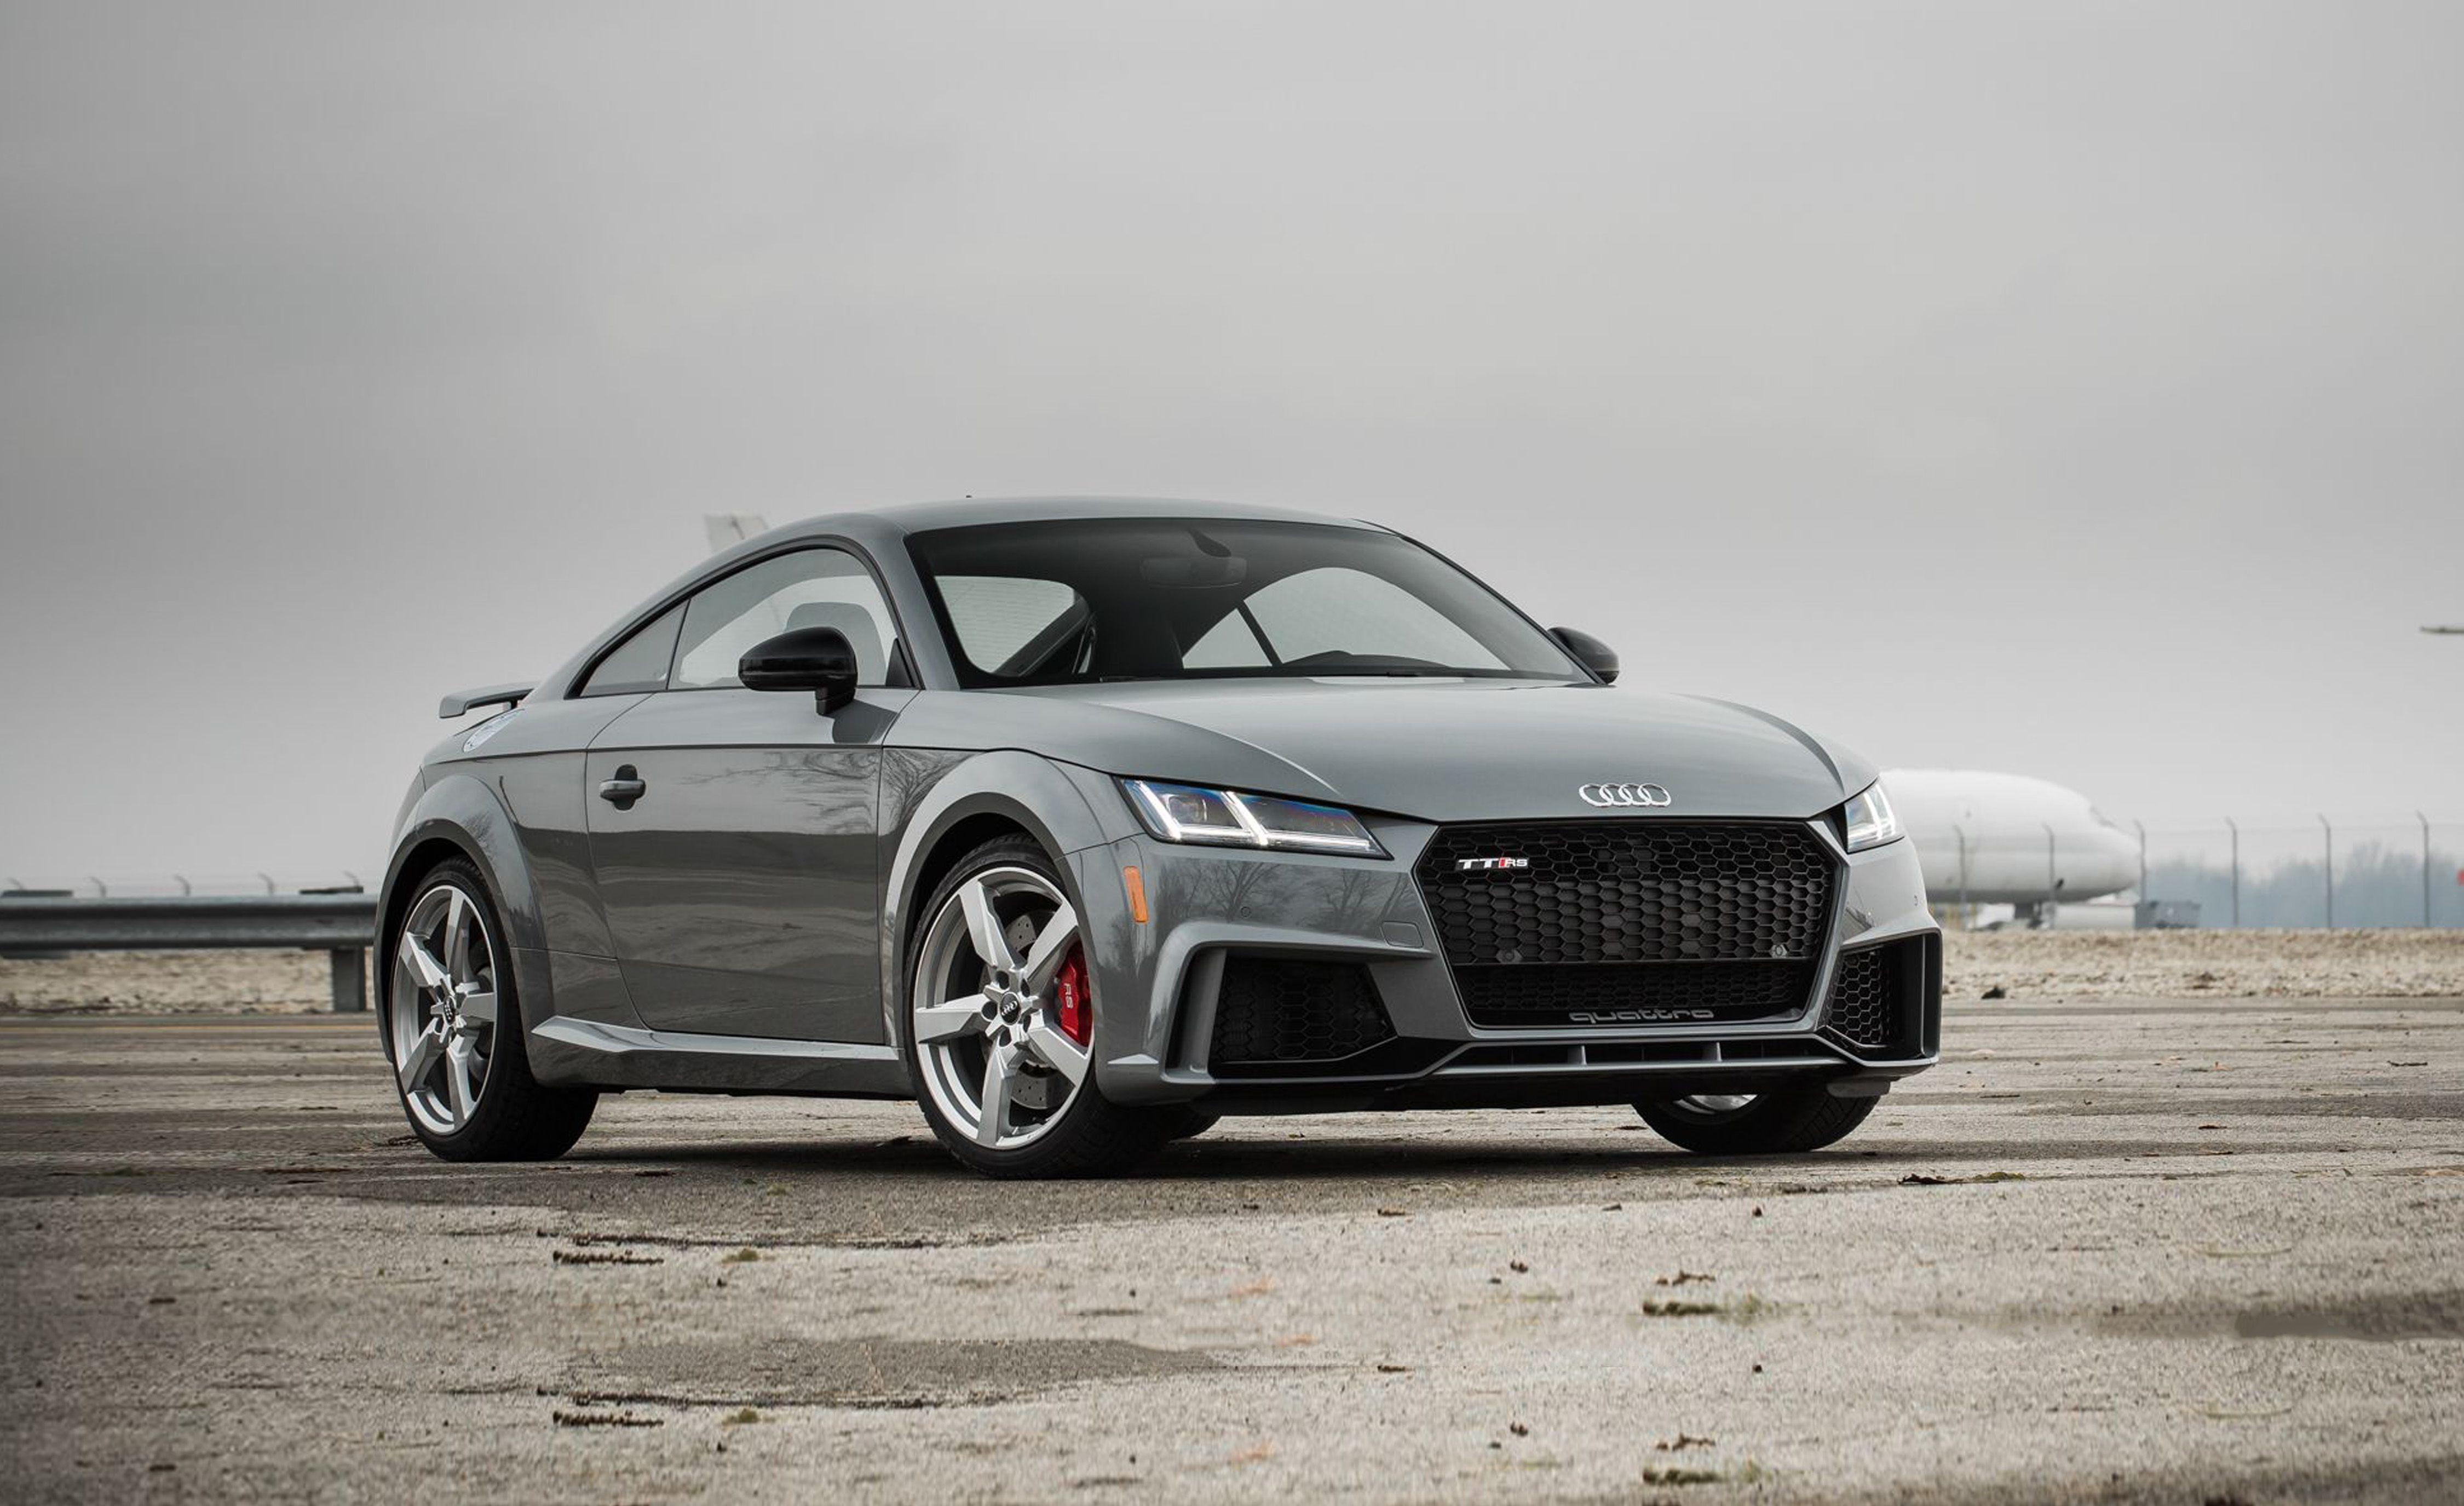 2019 Audi Tt Rs Reviews Audi Tt Rs Price Photos And Specs Car